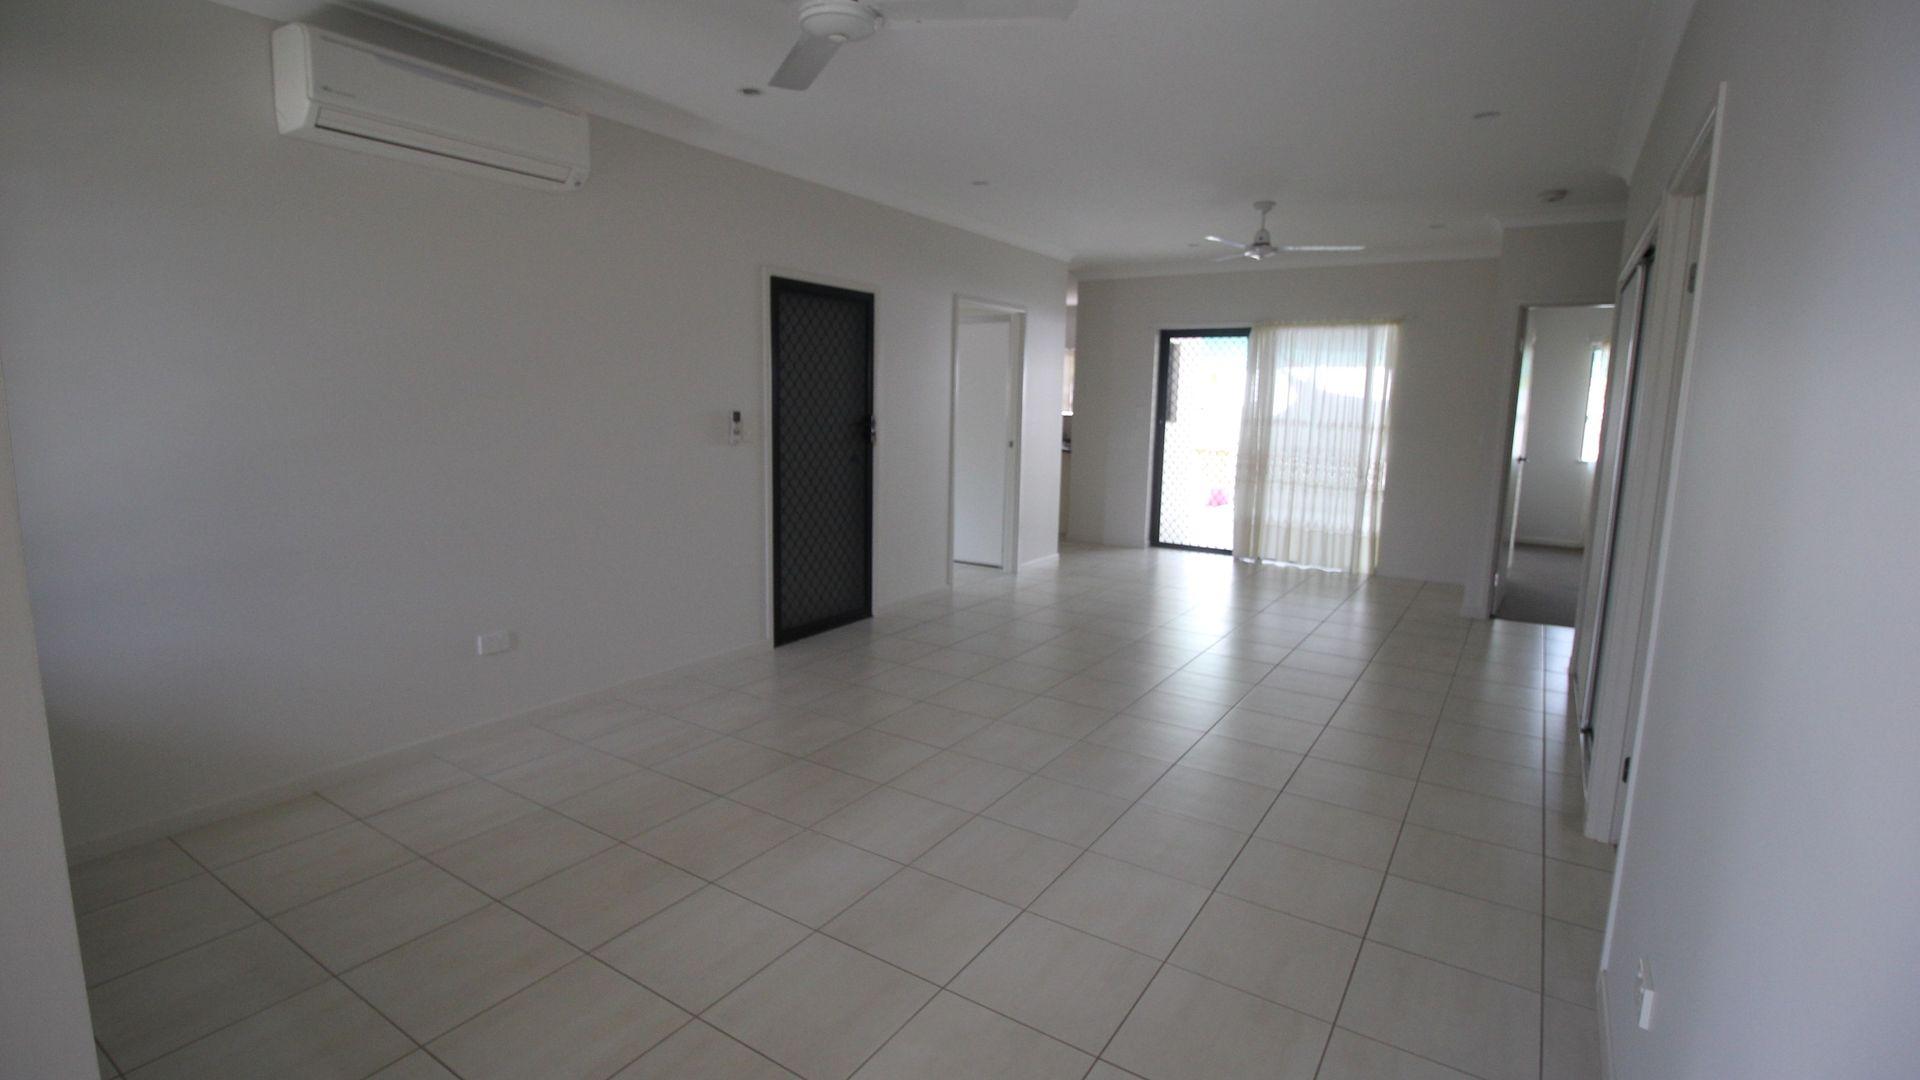 3/30 Eleanor Street, Ingham QLD 4850, Image 2